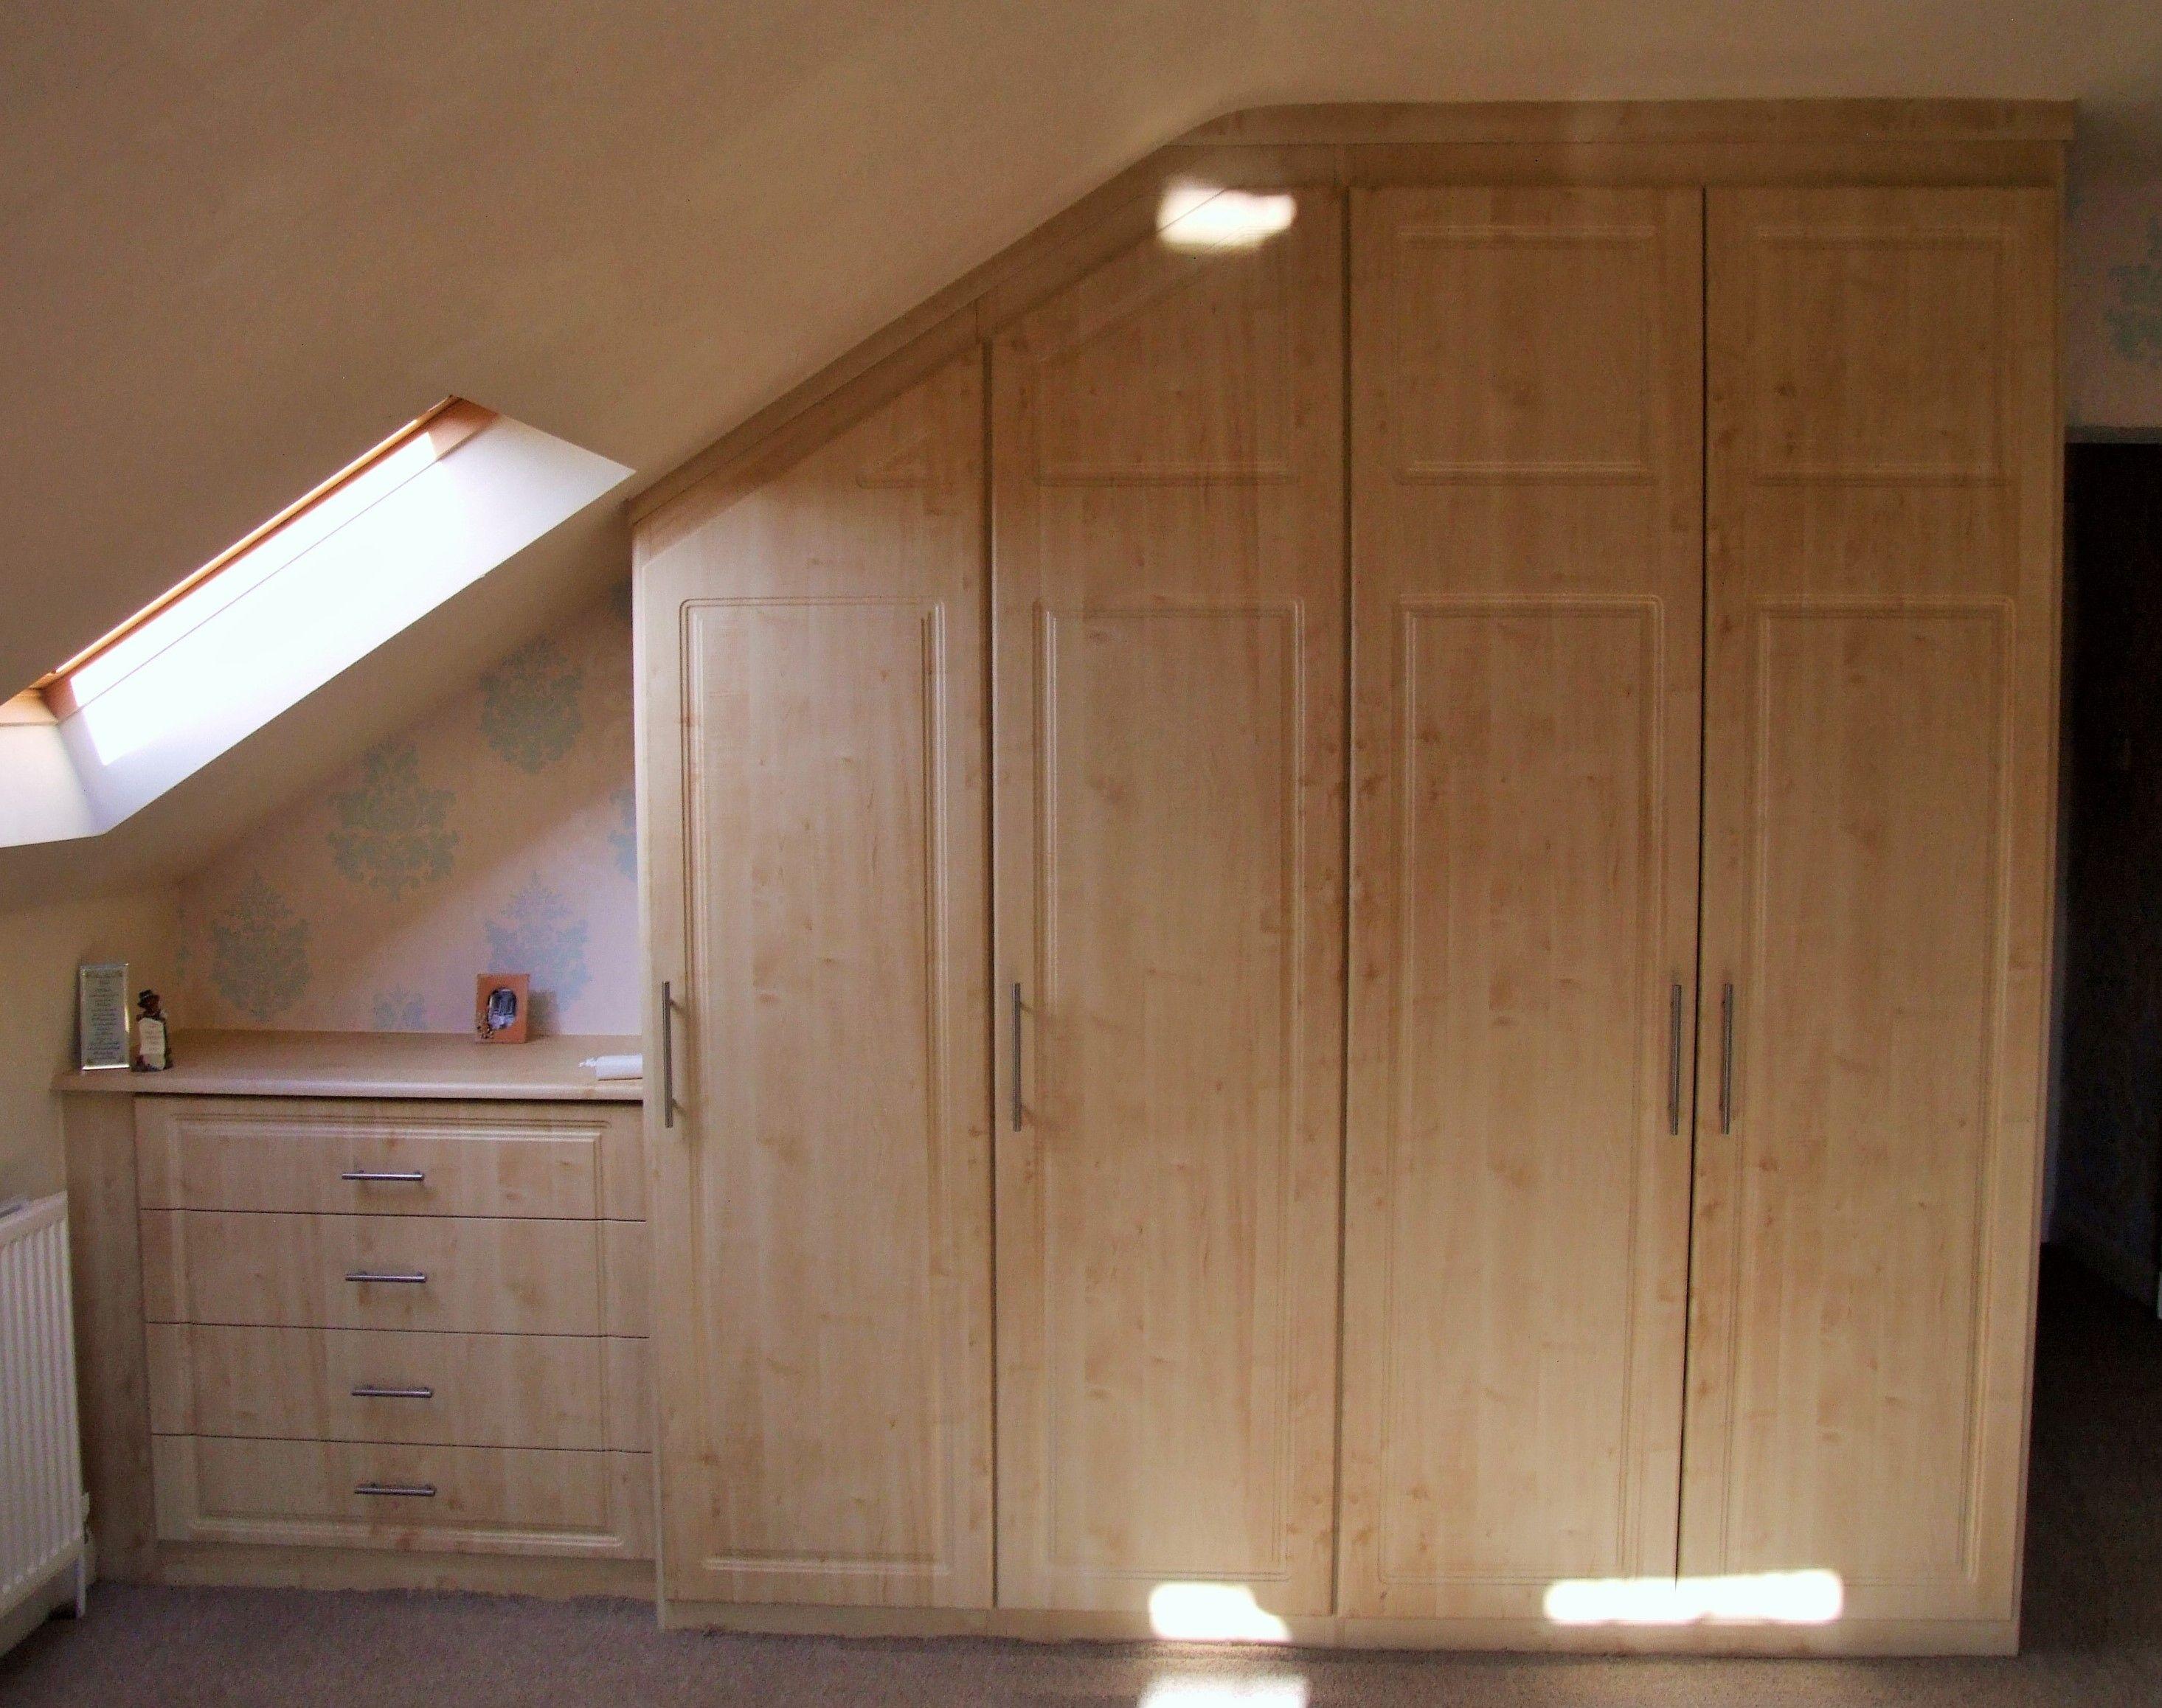 Bedroom Furniture Yorkshire attic bedroom furniture built into a sloping ceiling #bedroom